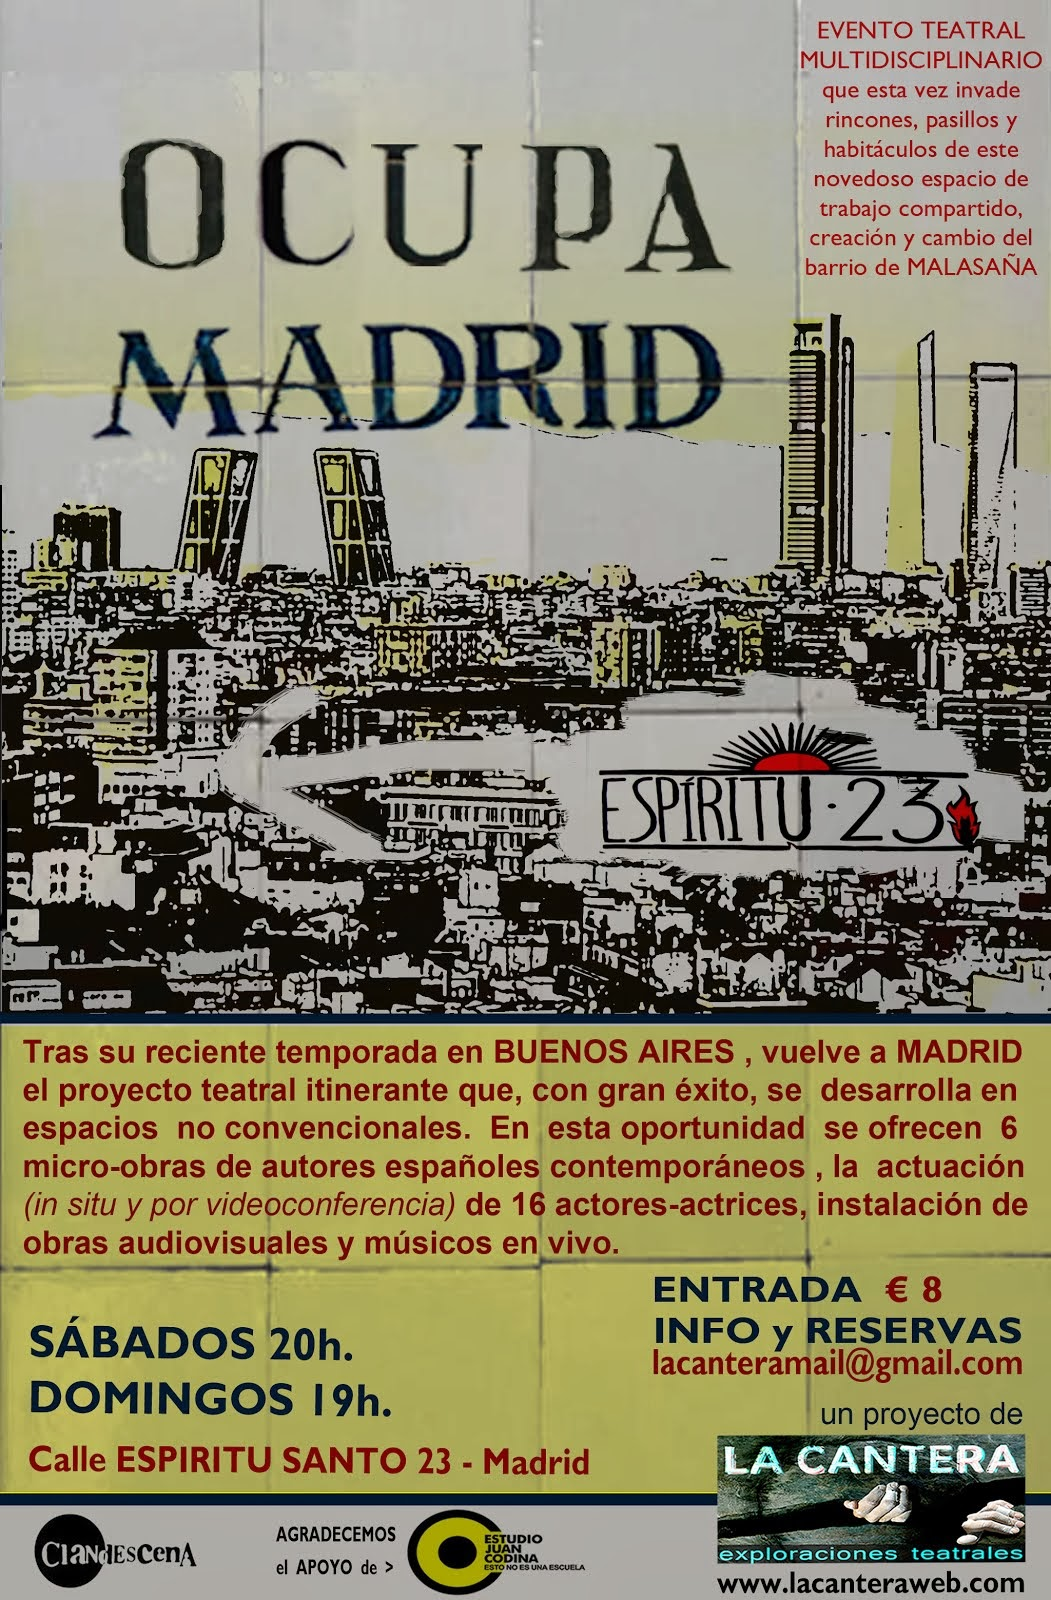 Ediciones ESPÍRITU 23